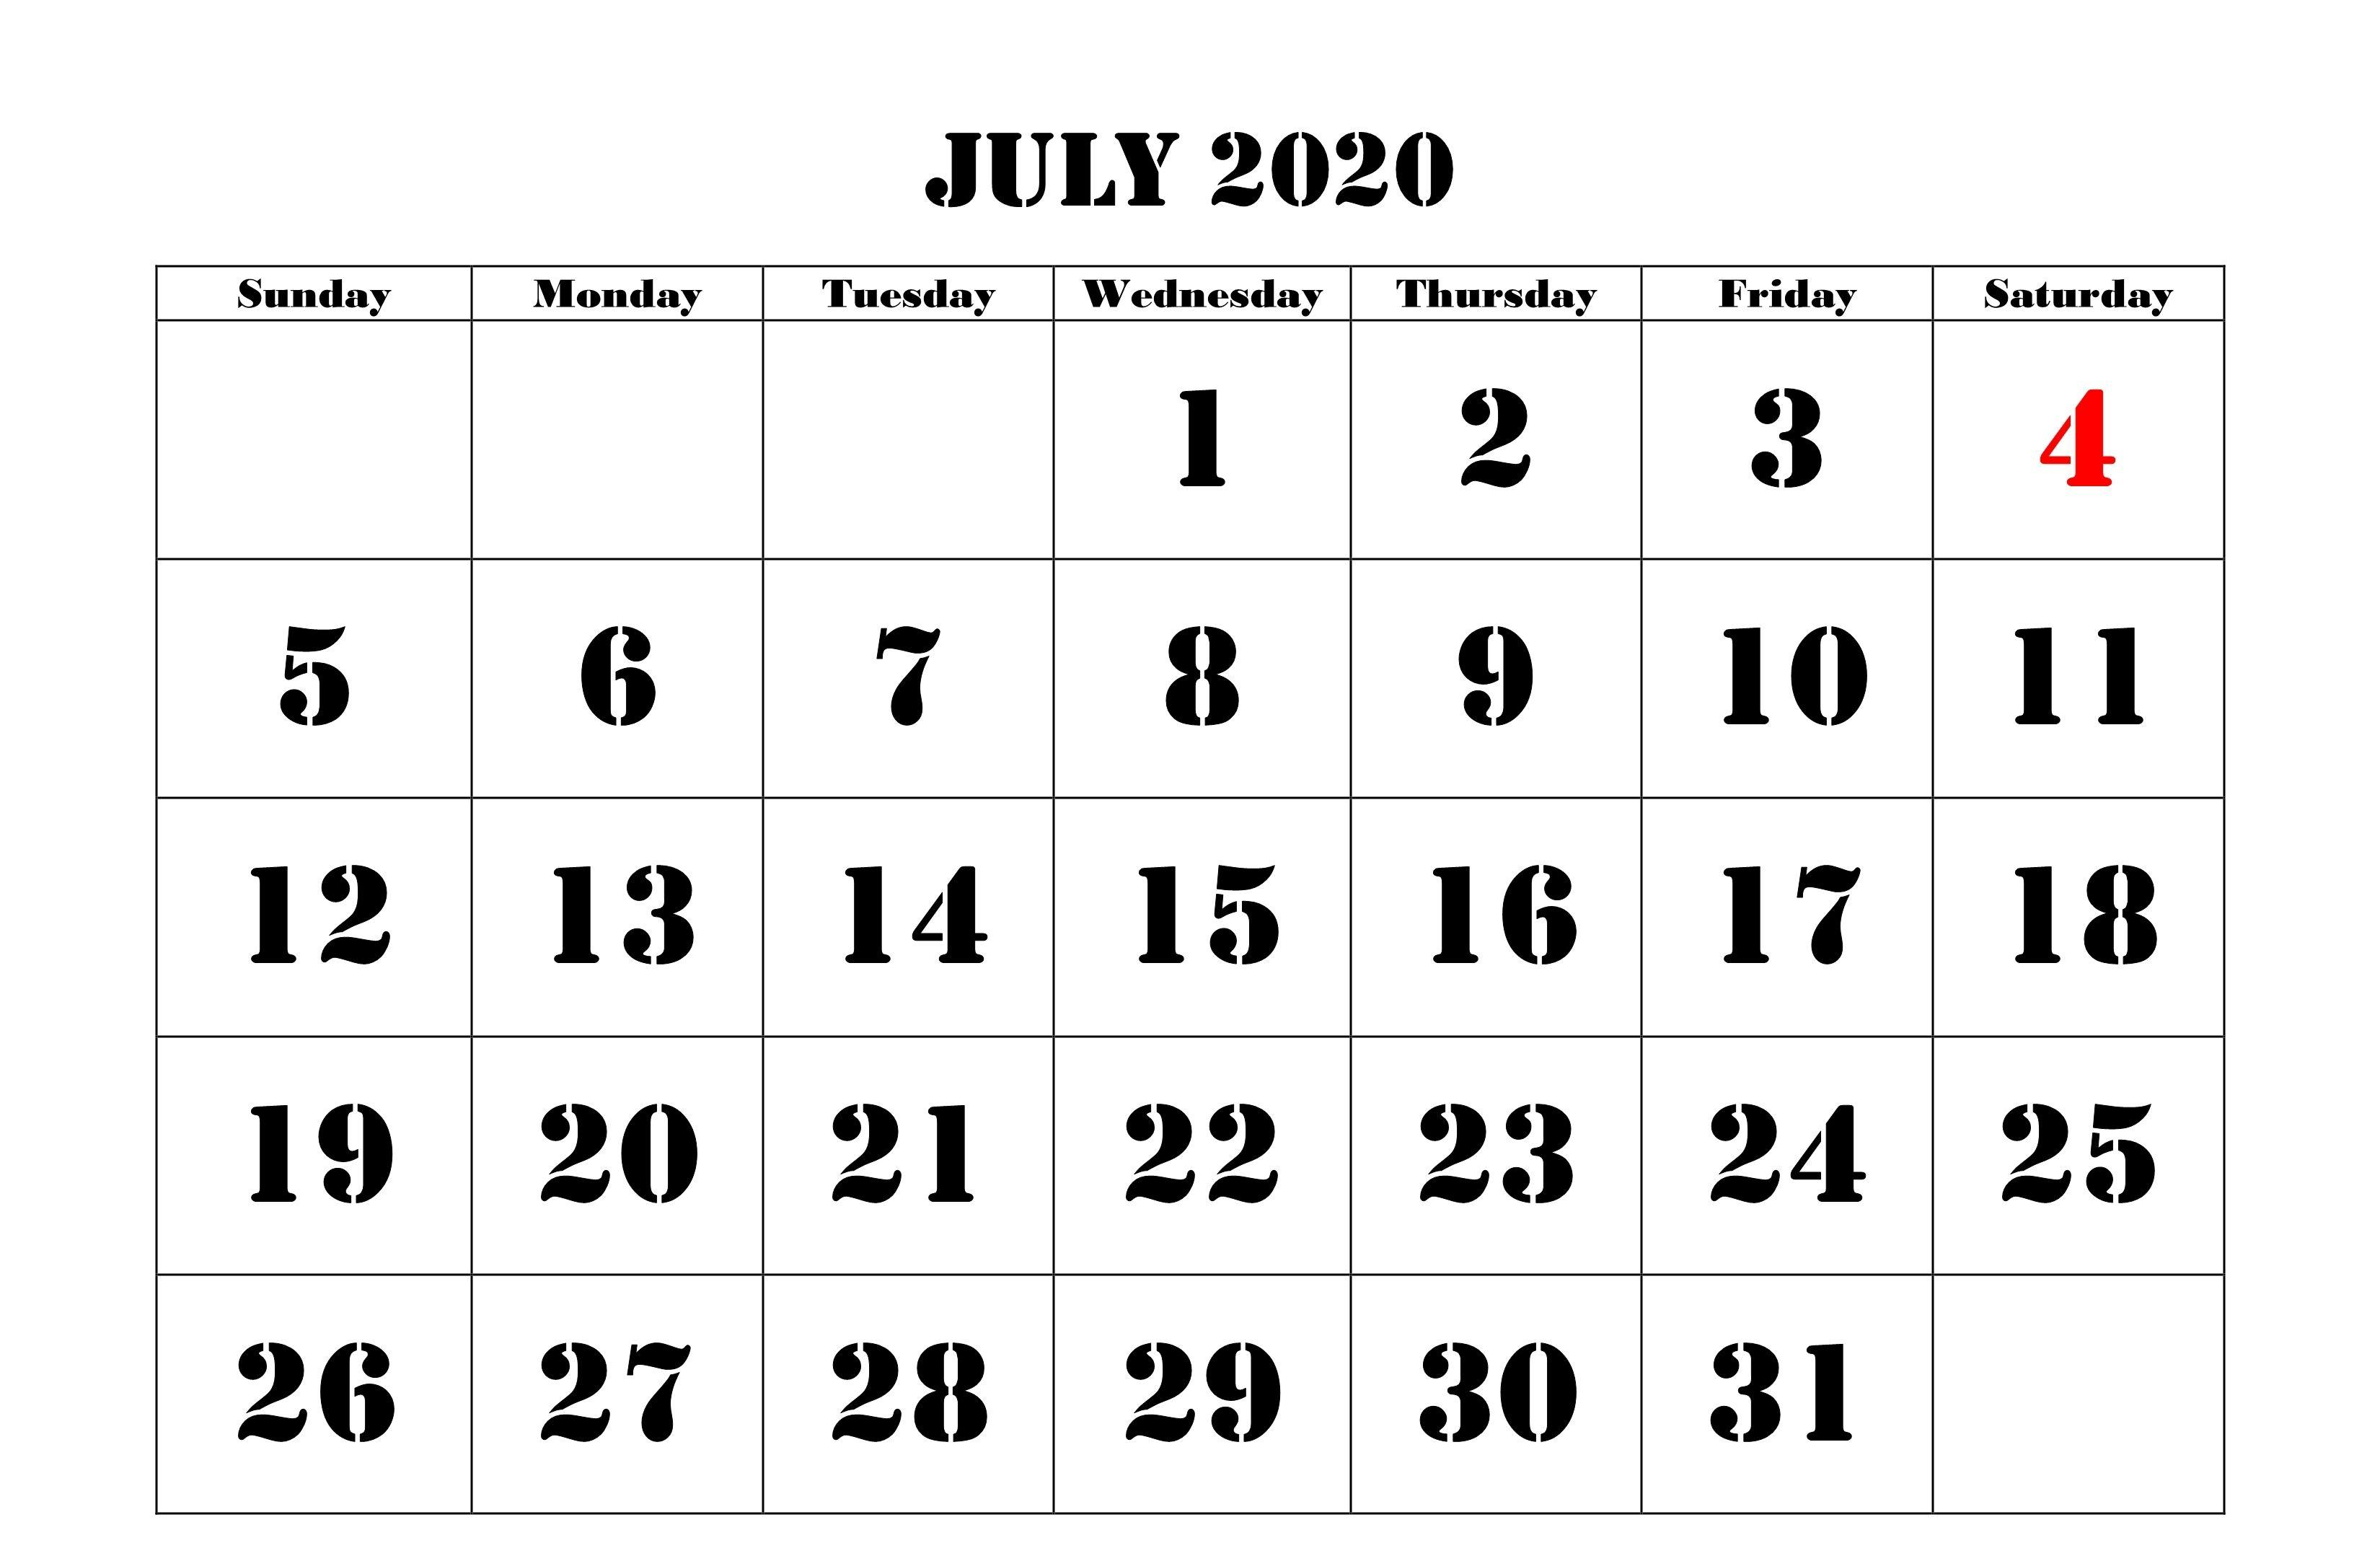 July 2020 Calendar Excel | July Calendar, Calendar 2020